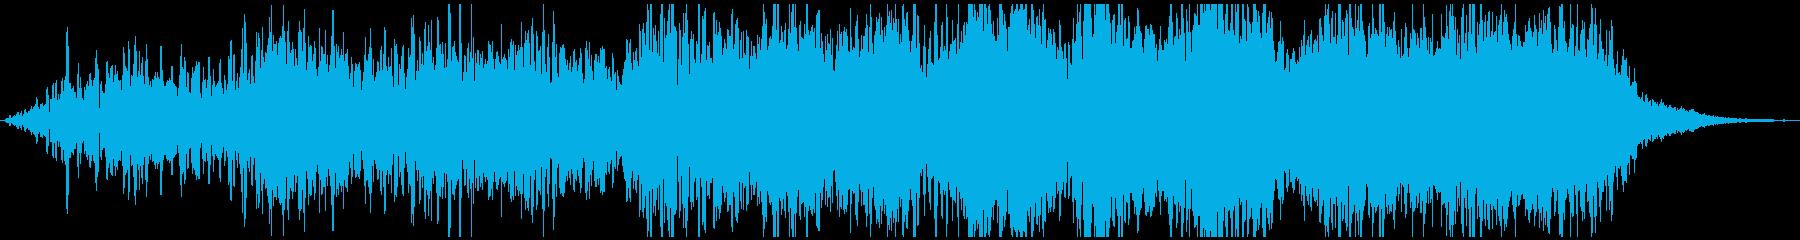 PADS 悲しいUh合唱団01の再生済みの波形